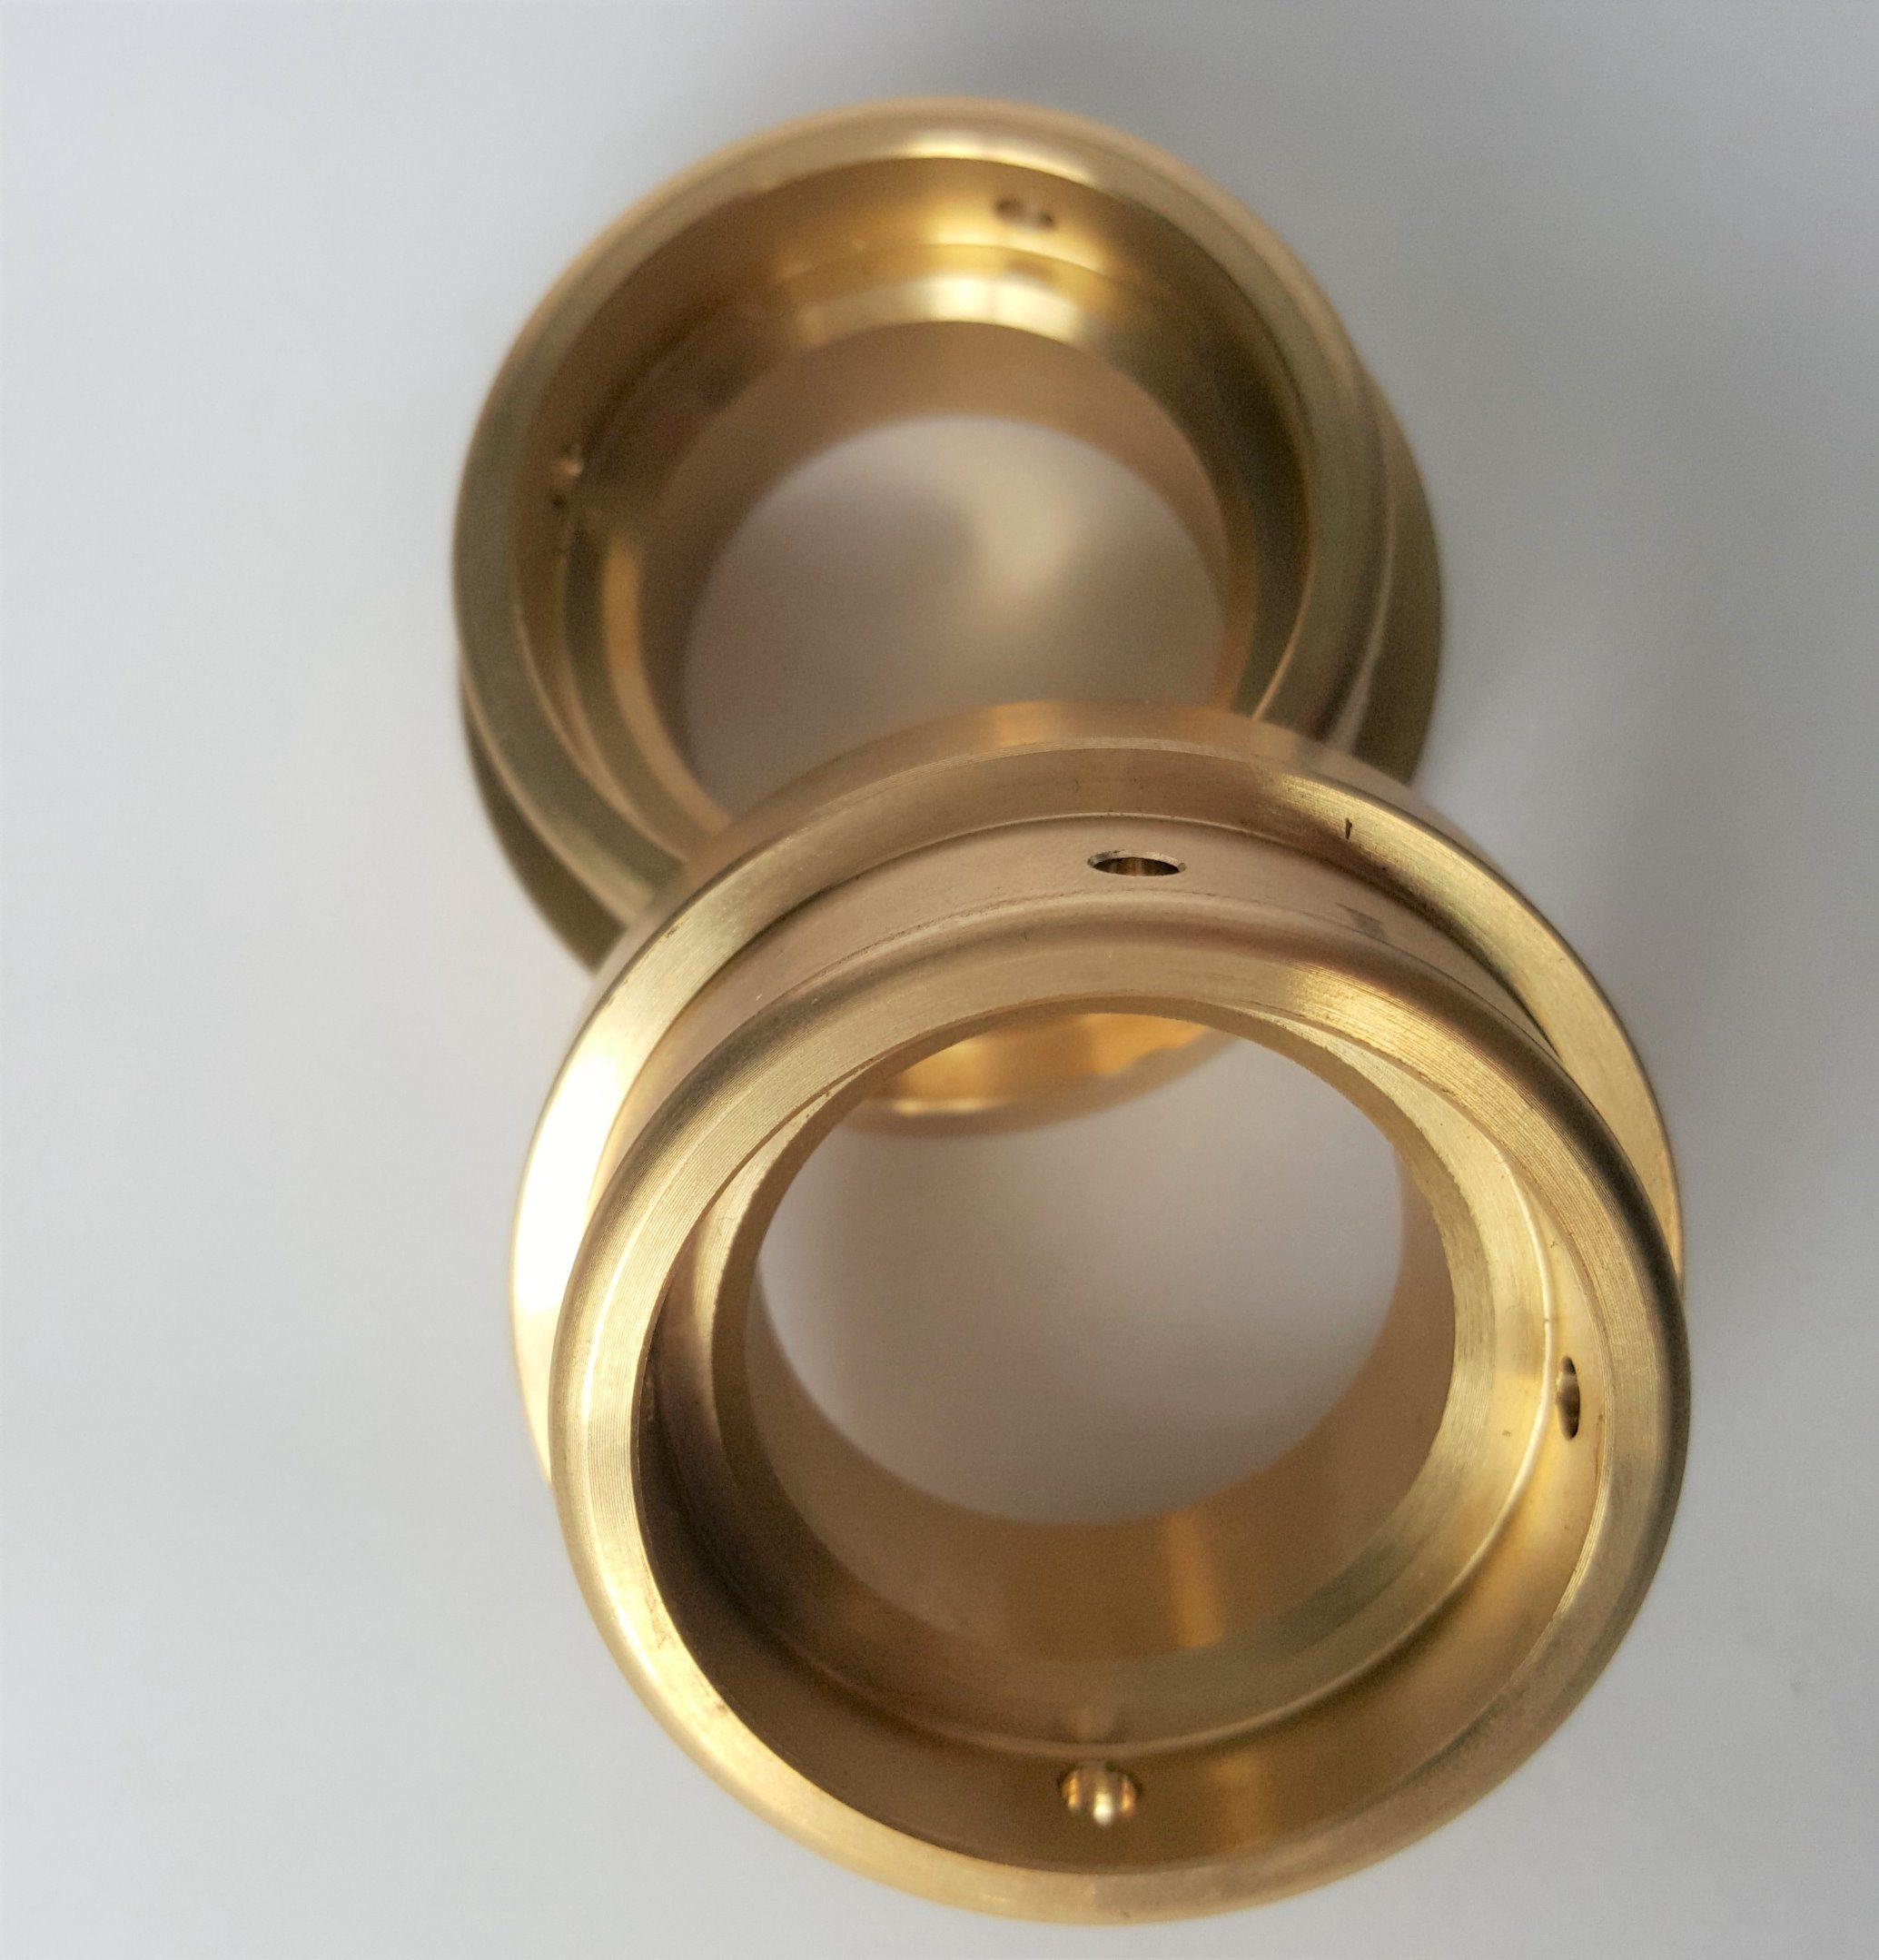 OEM Precision Machinery CNC Machined/Machining (parts for machine shop, custom machining, CNC cutting, CNC turning, CNC Engineering)